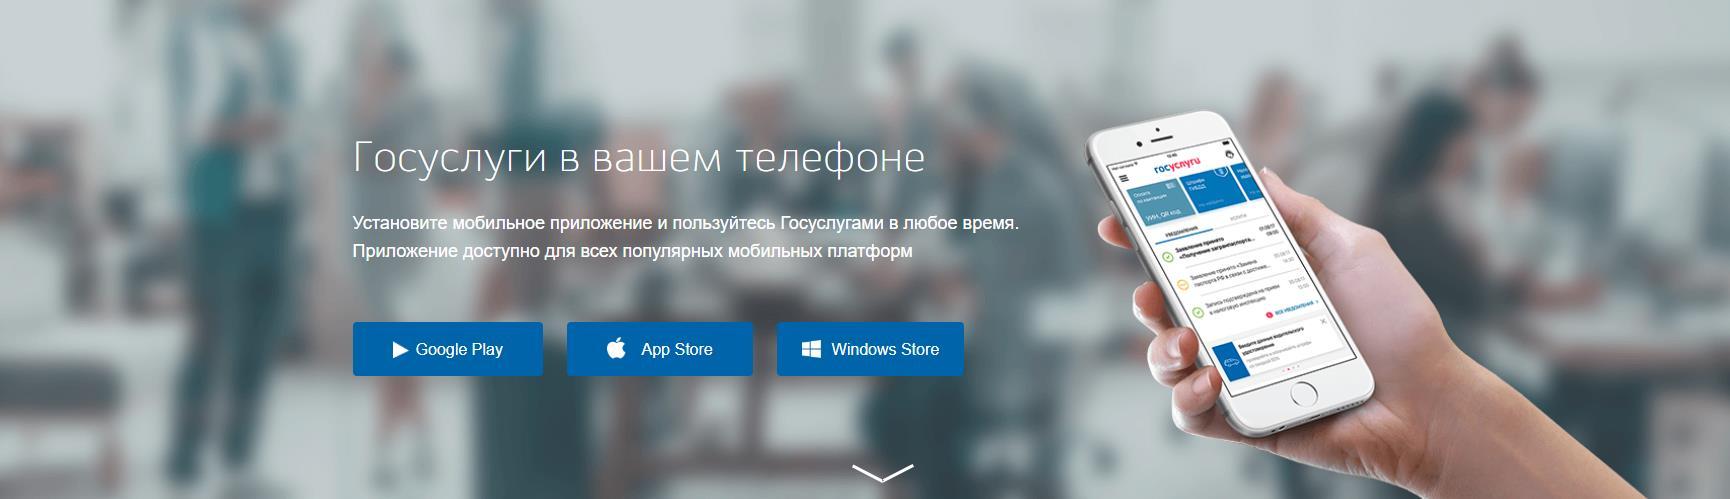 Госуслуги приложение на телефон